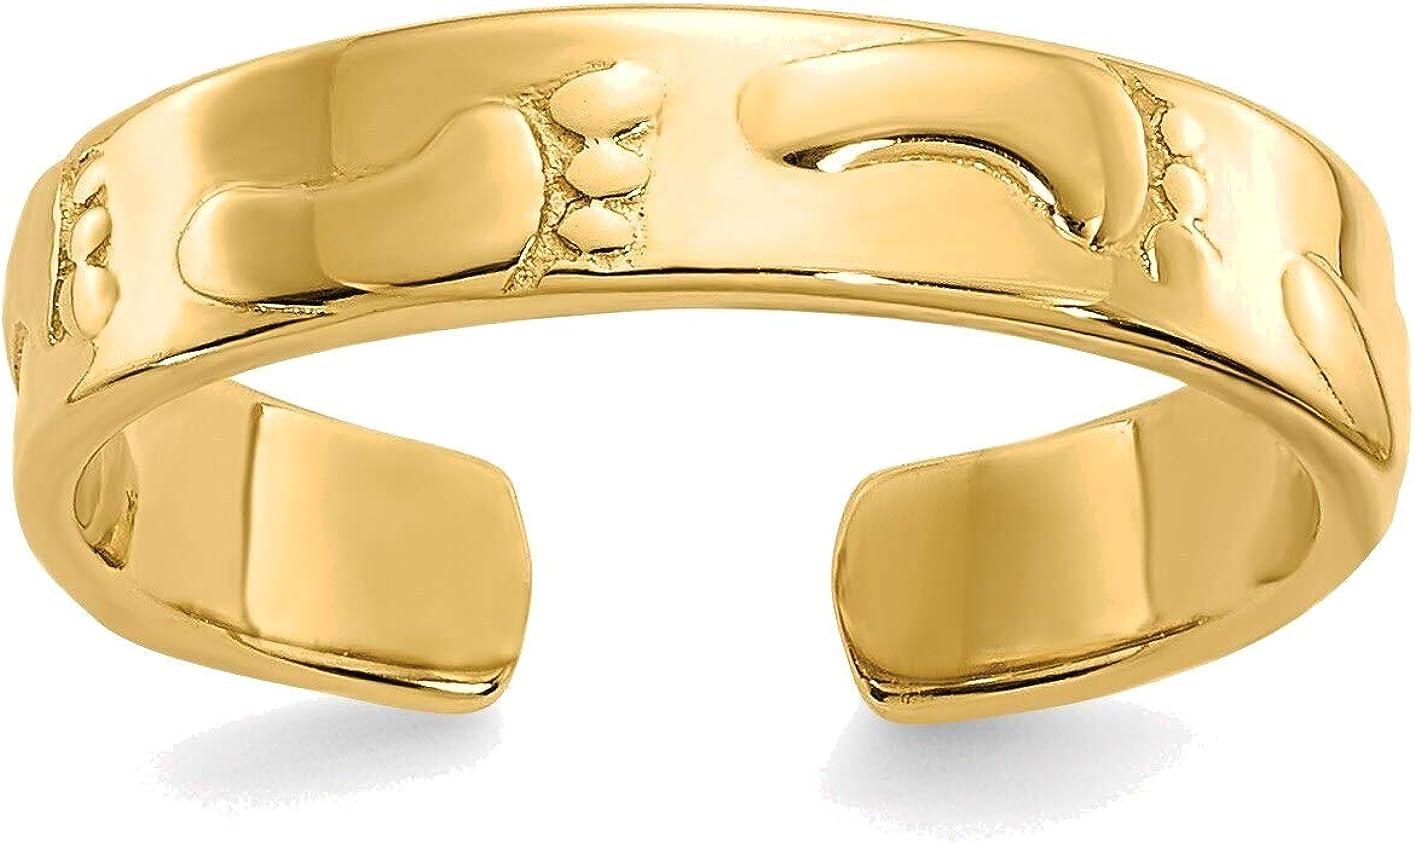 Bonyak Jewelry Footprints Toe Ring in 14K Yellow Gold in Size 11